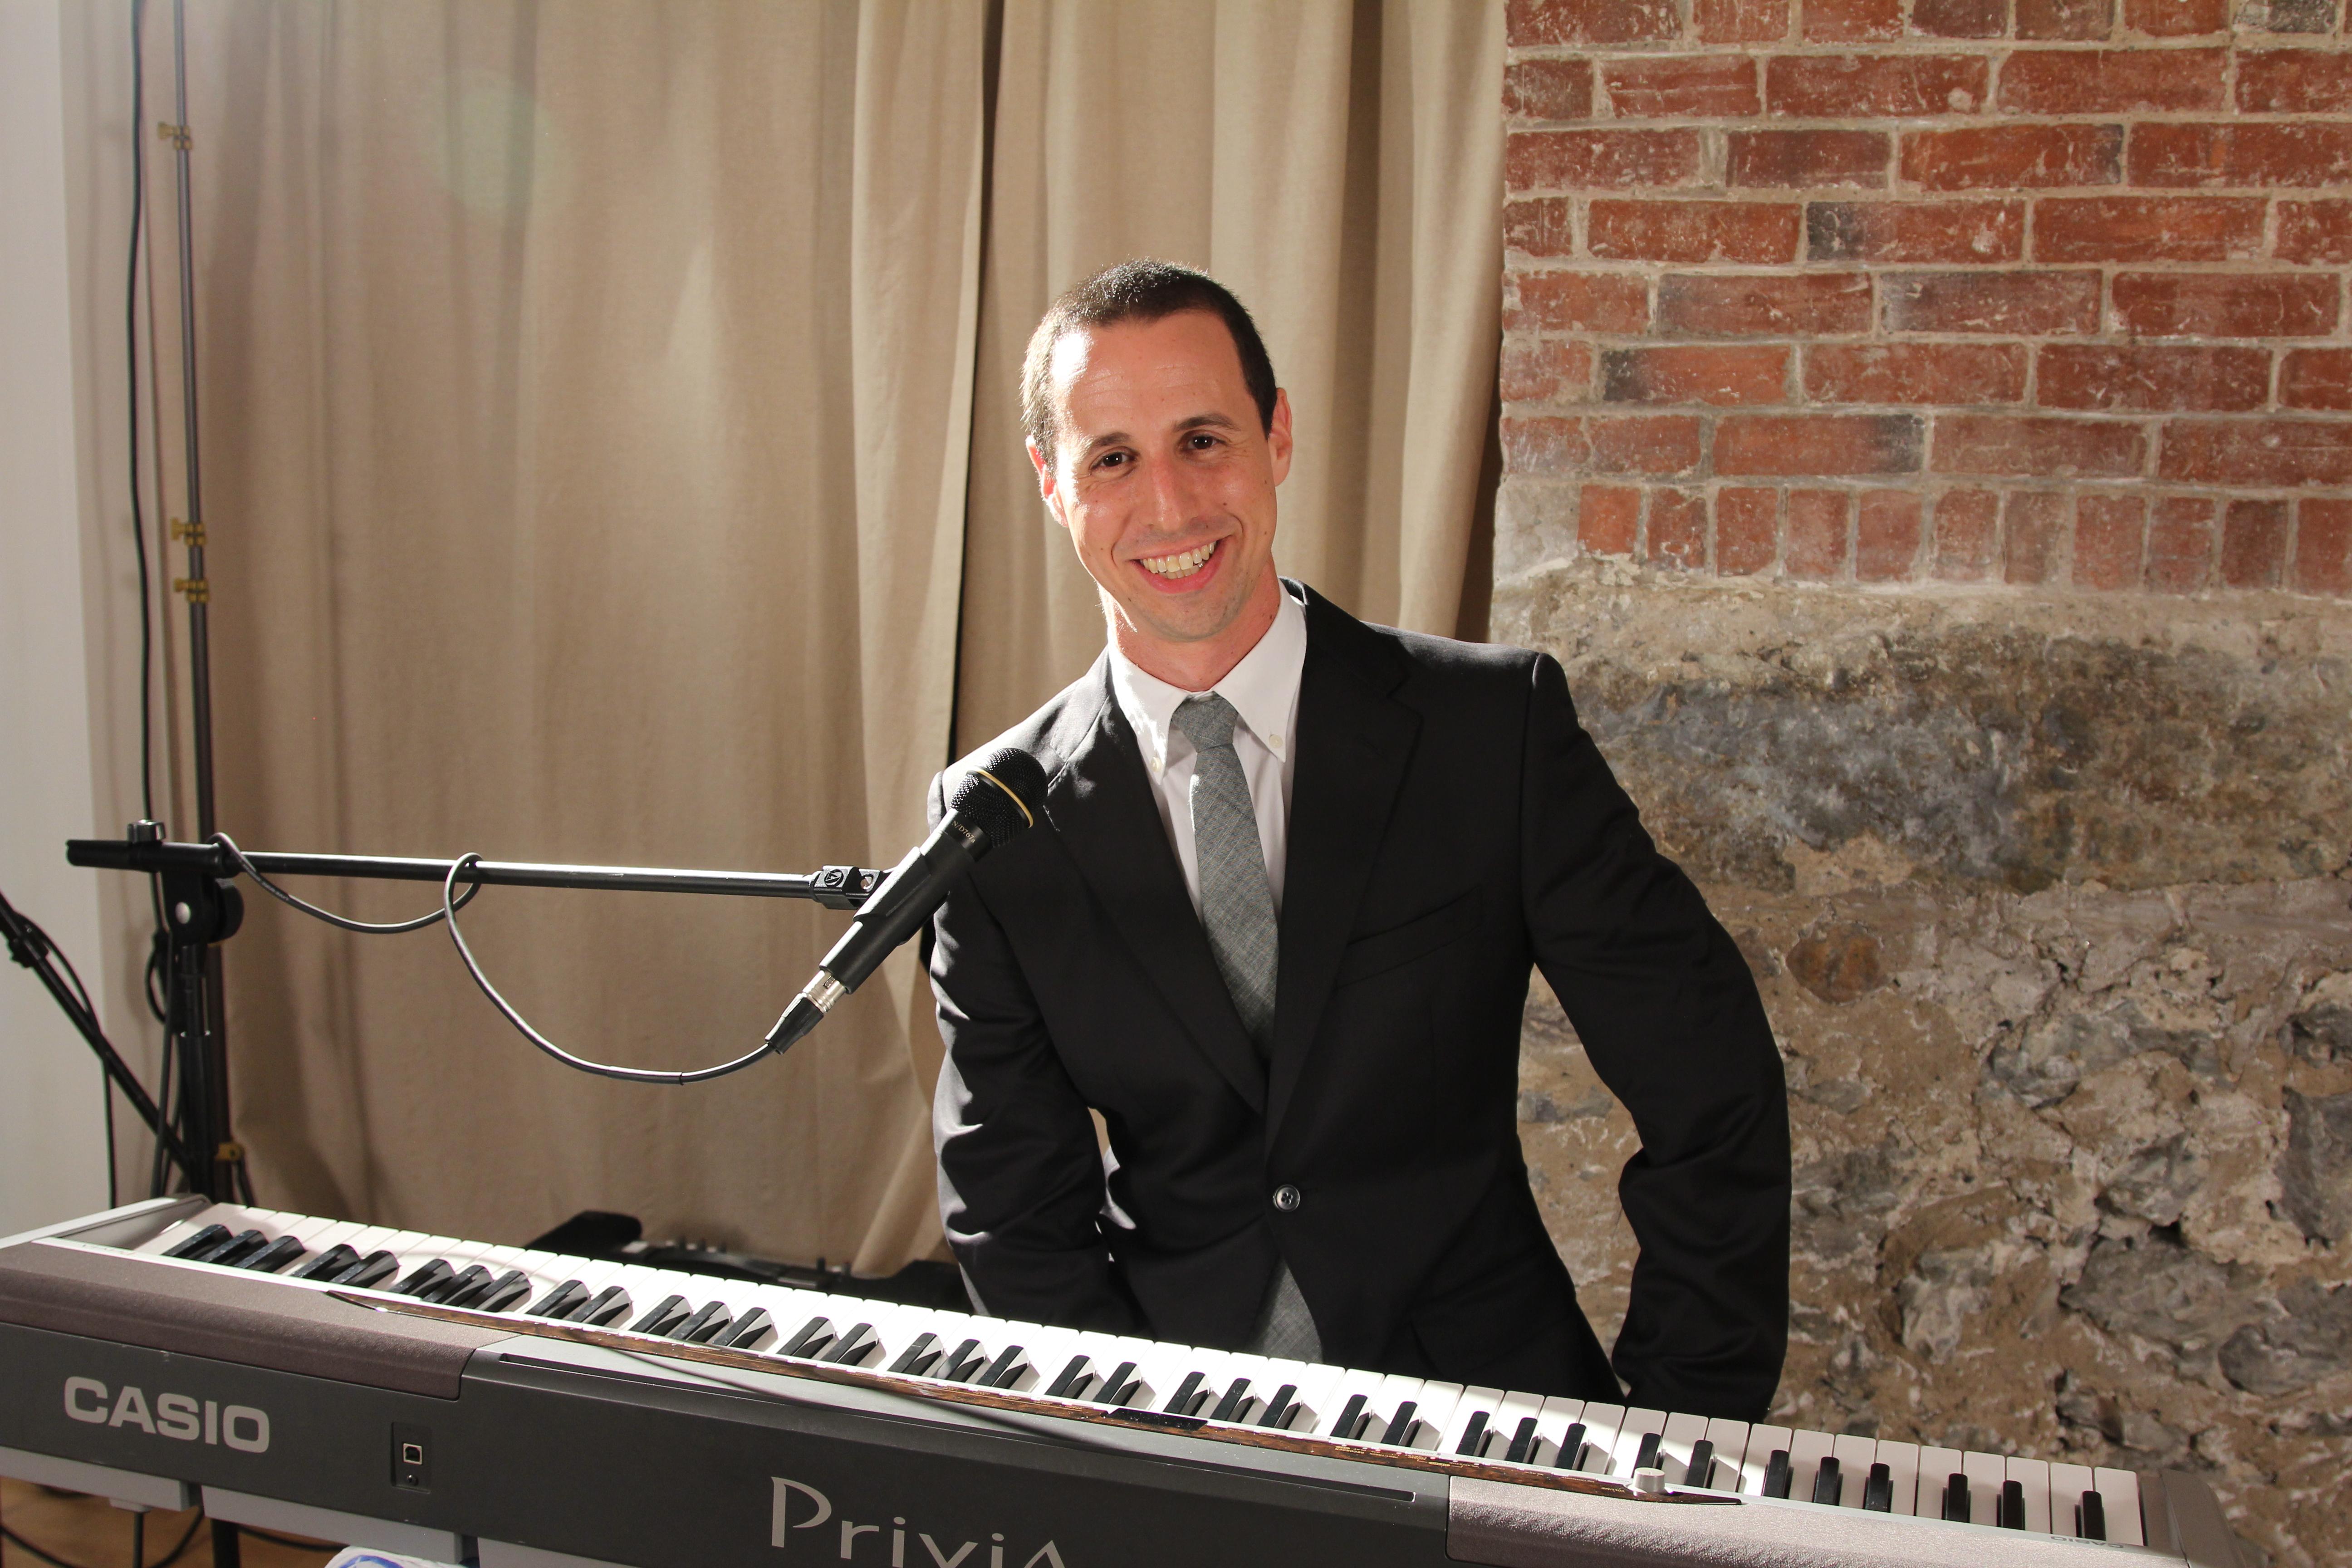 Avi Wisnia Keyboard Headshot Boston MA Seth Kroll Photography Promo Photo Portrait